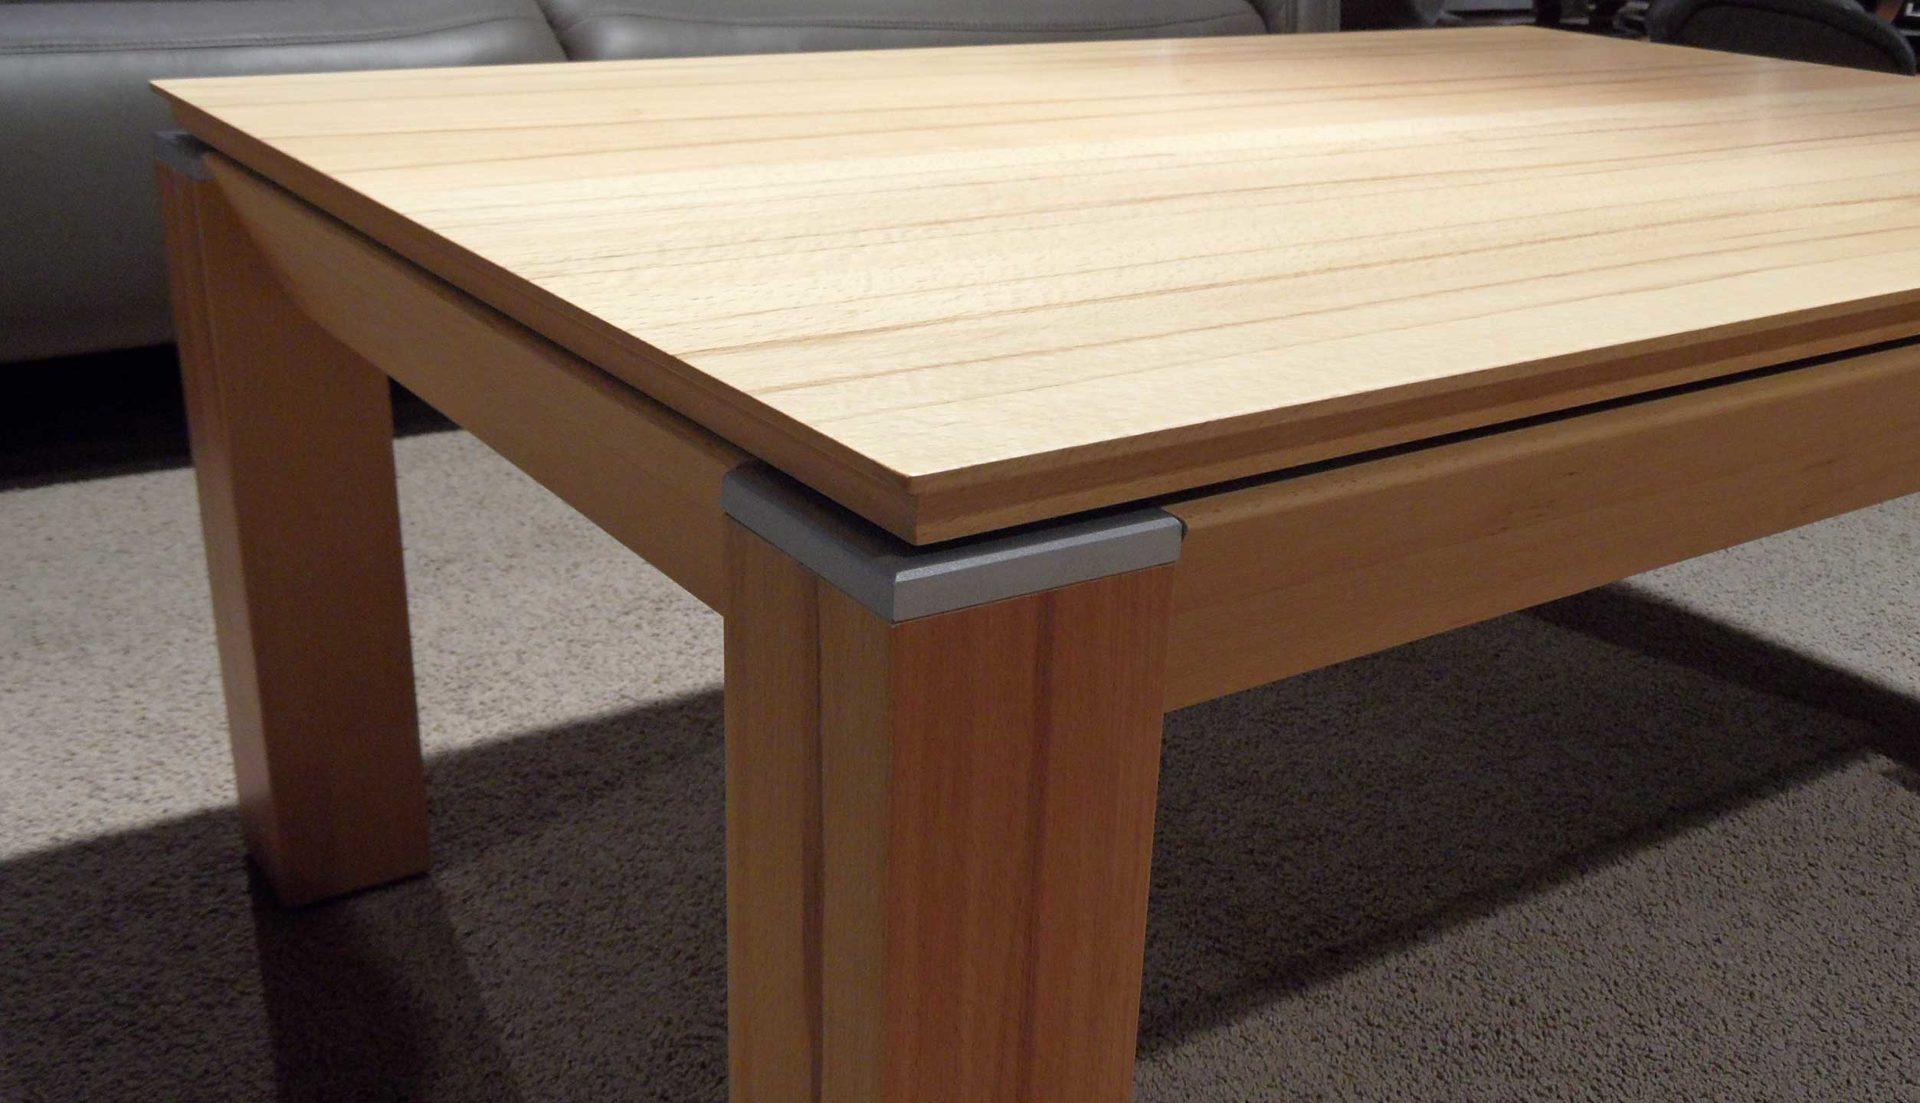 Tischplatte holz natur  Tischplatte Holz Couchtisch